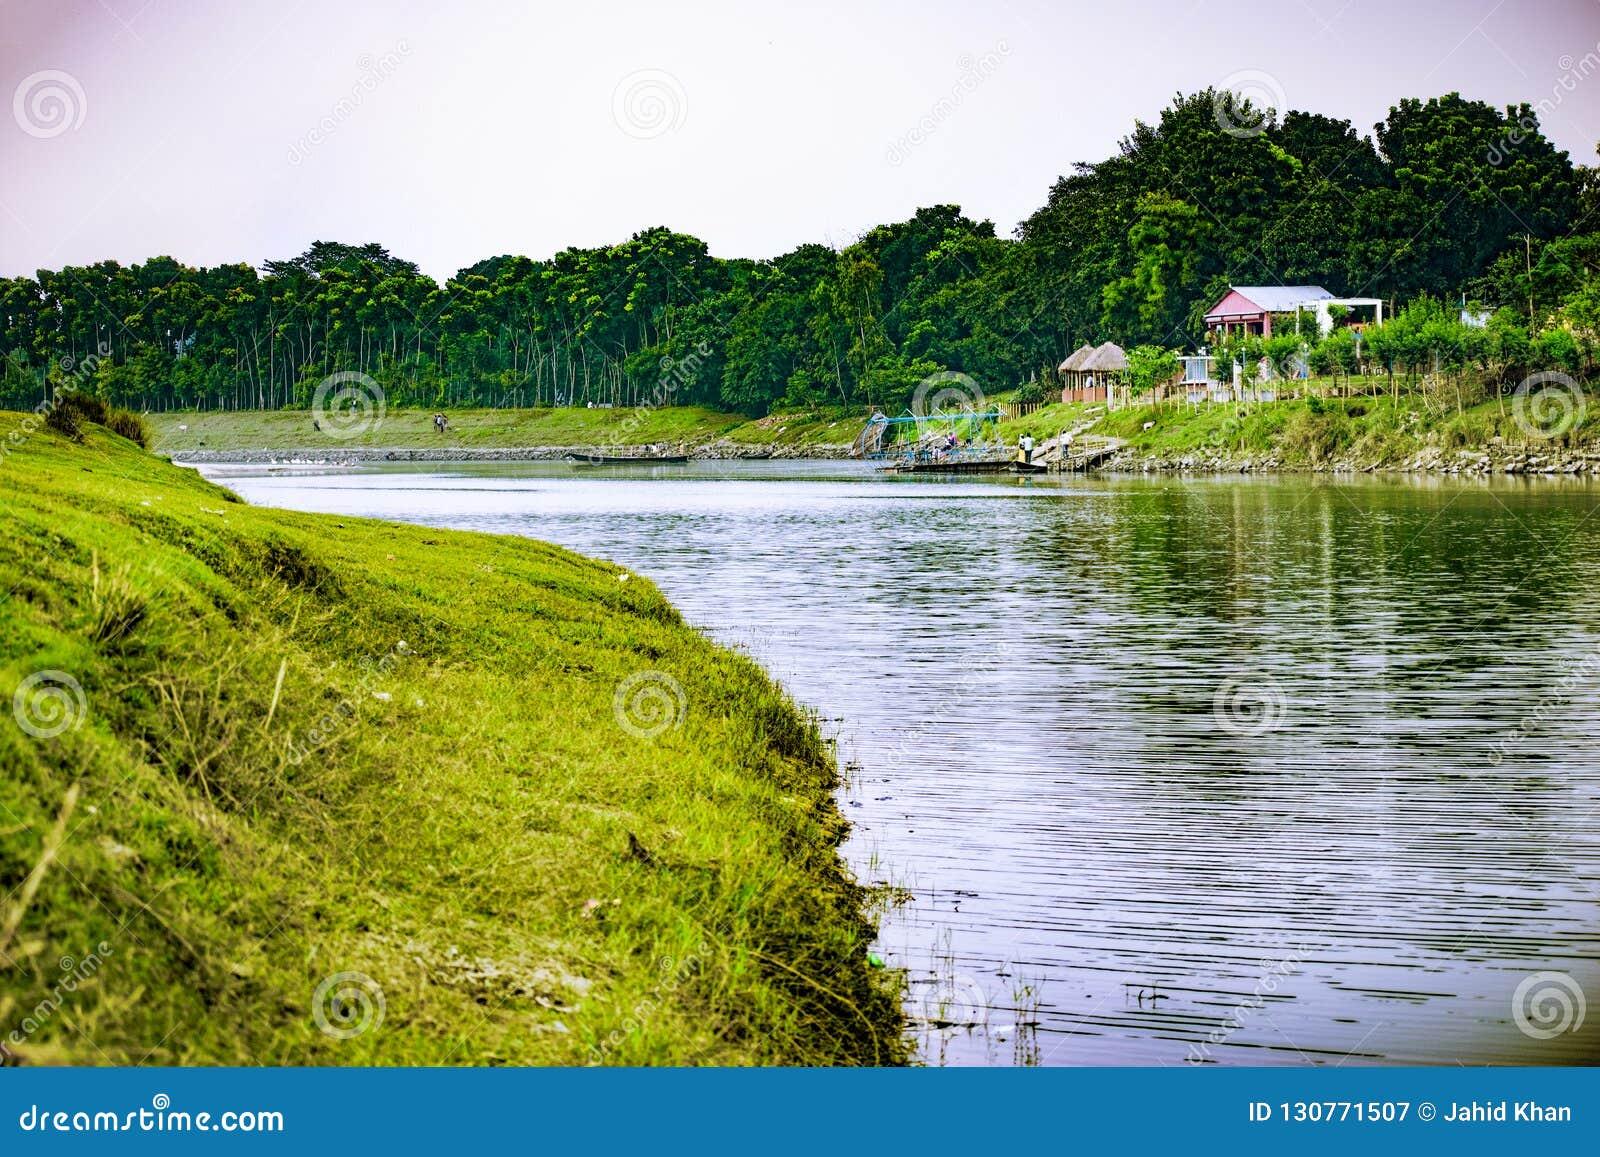 Rivière de Punorvoba, Dinajpur,  de jshÄ de  de RÄ salut, le Bangladesh